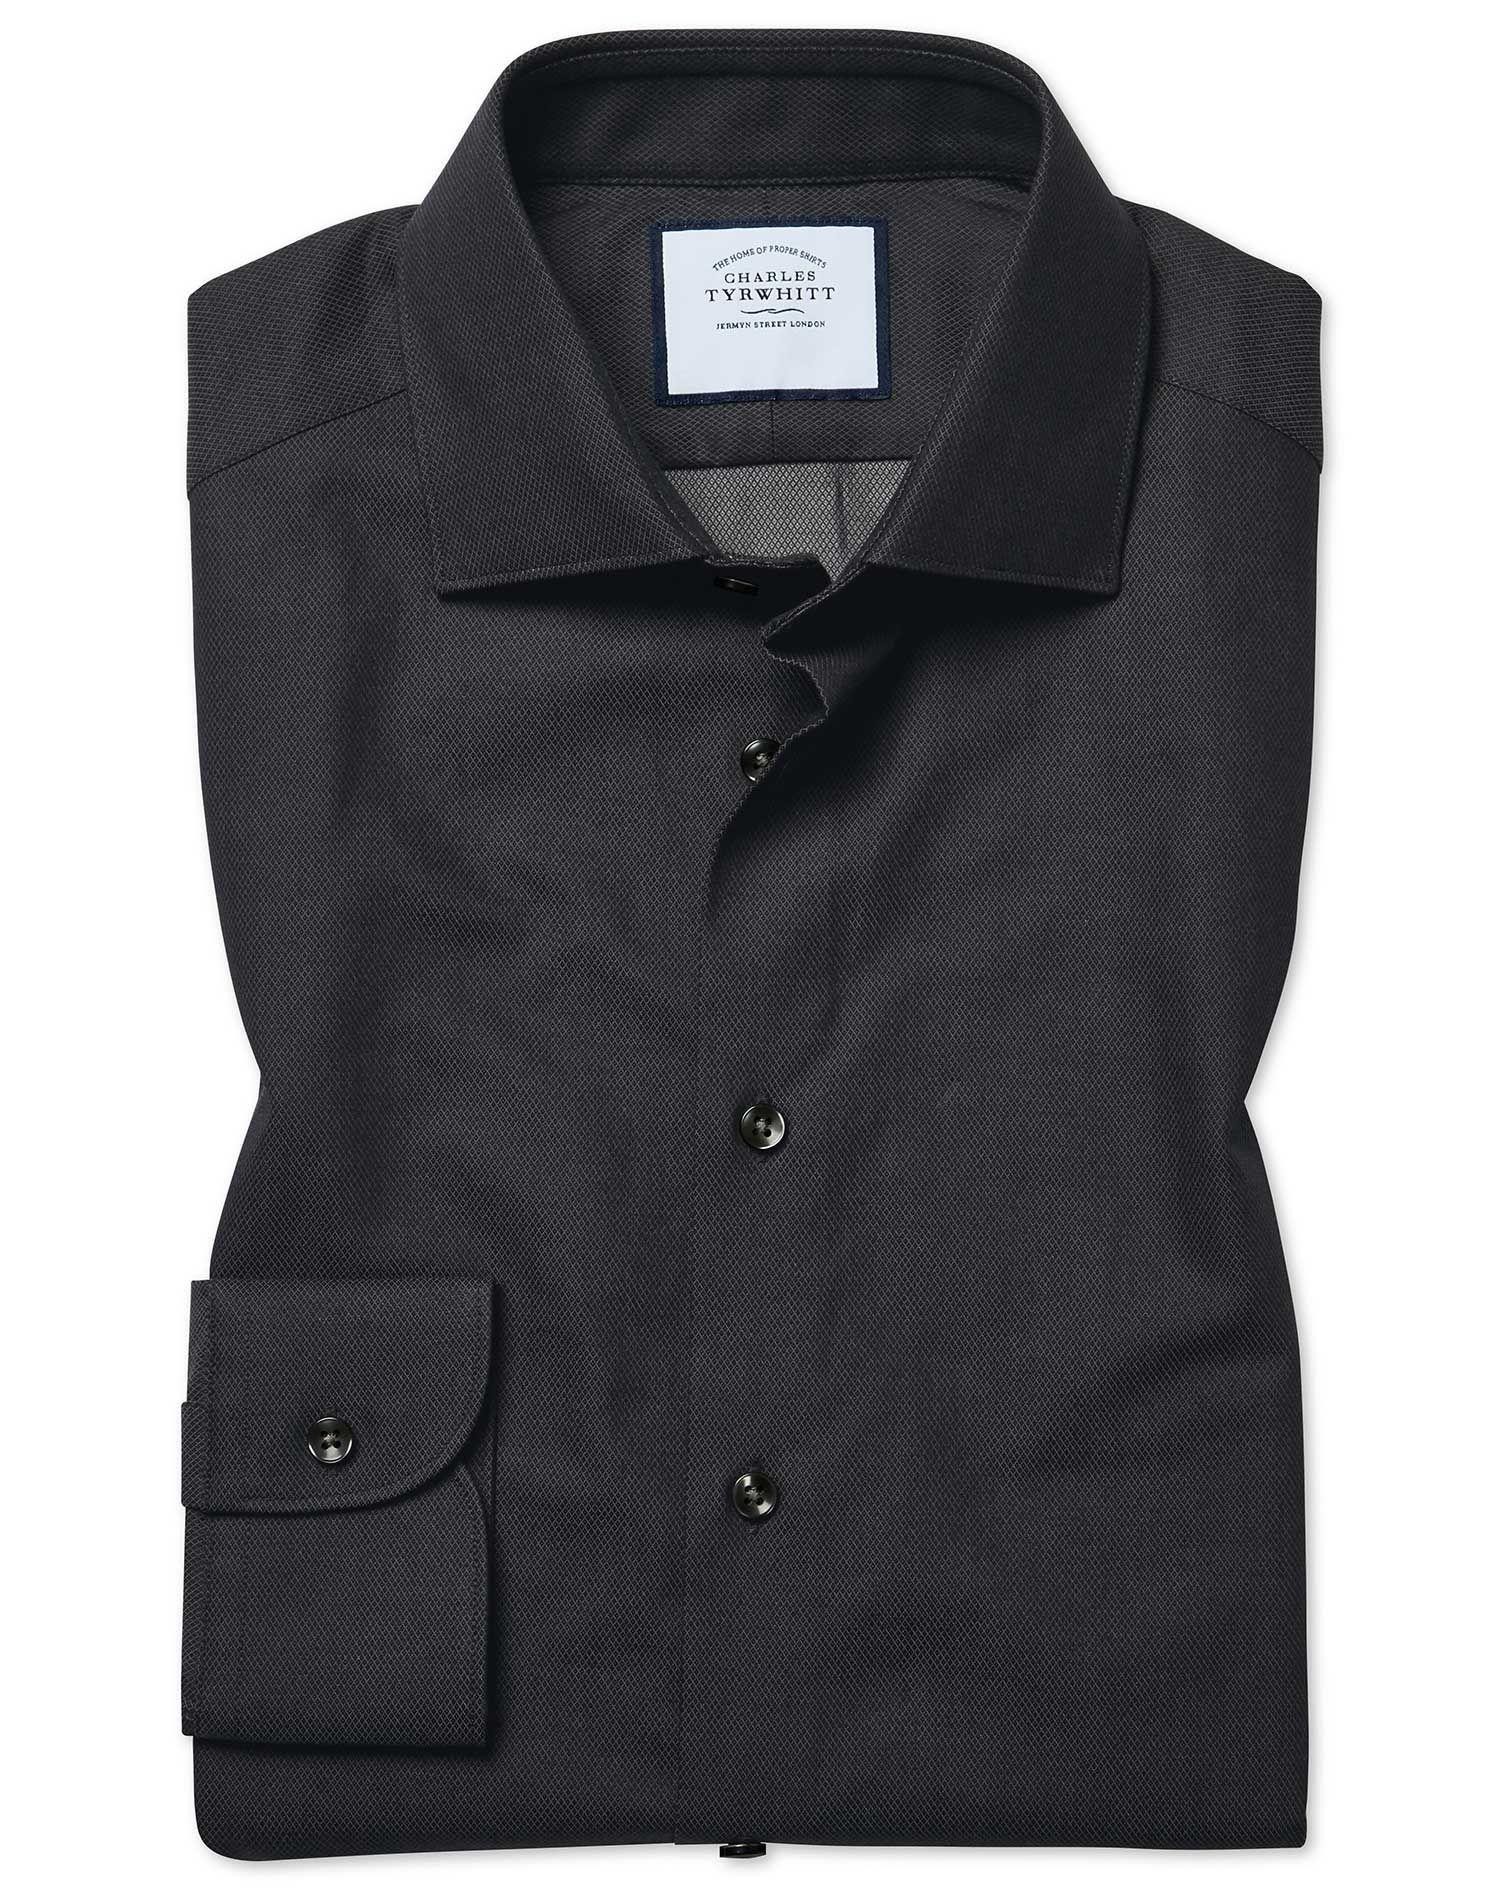 Extra Slim Fit Micro Diamond Charcoal Cotton Dress Shirt